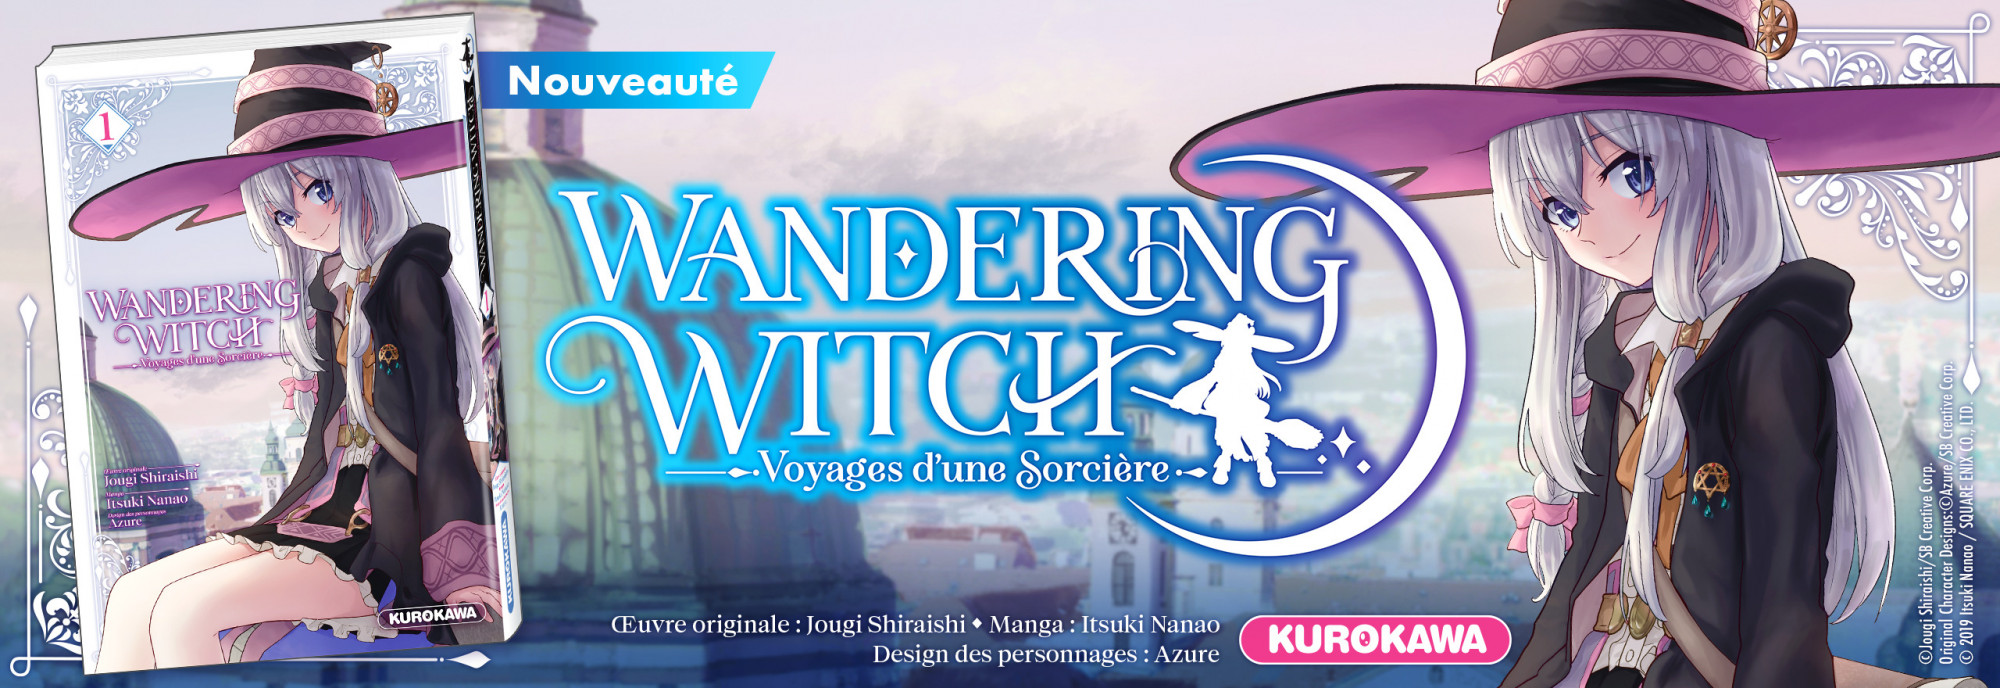 7103_1_Wandering-Witch-Visuel-Lisez-N0-Desktop-1280x440-2x.jpg